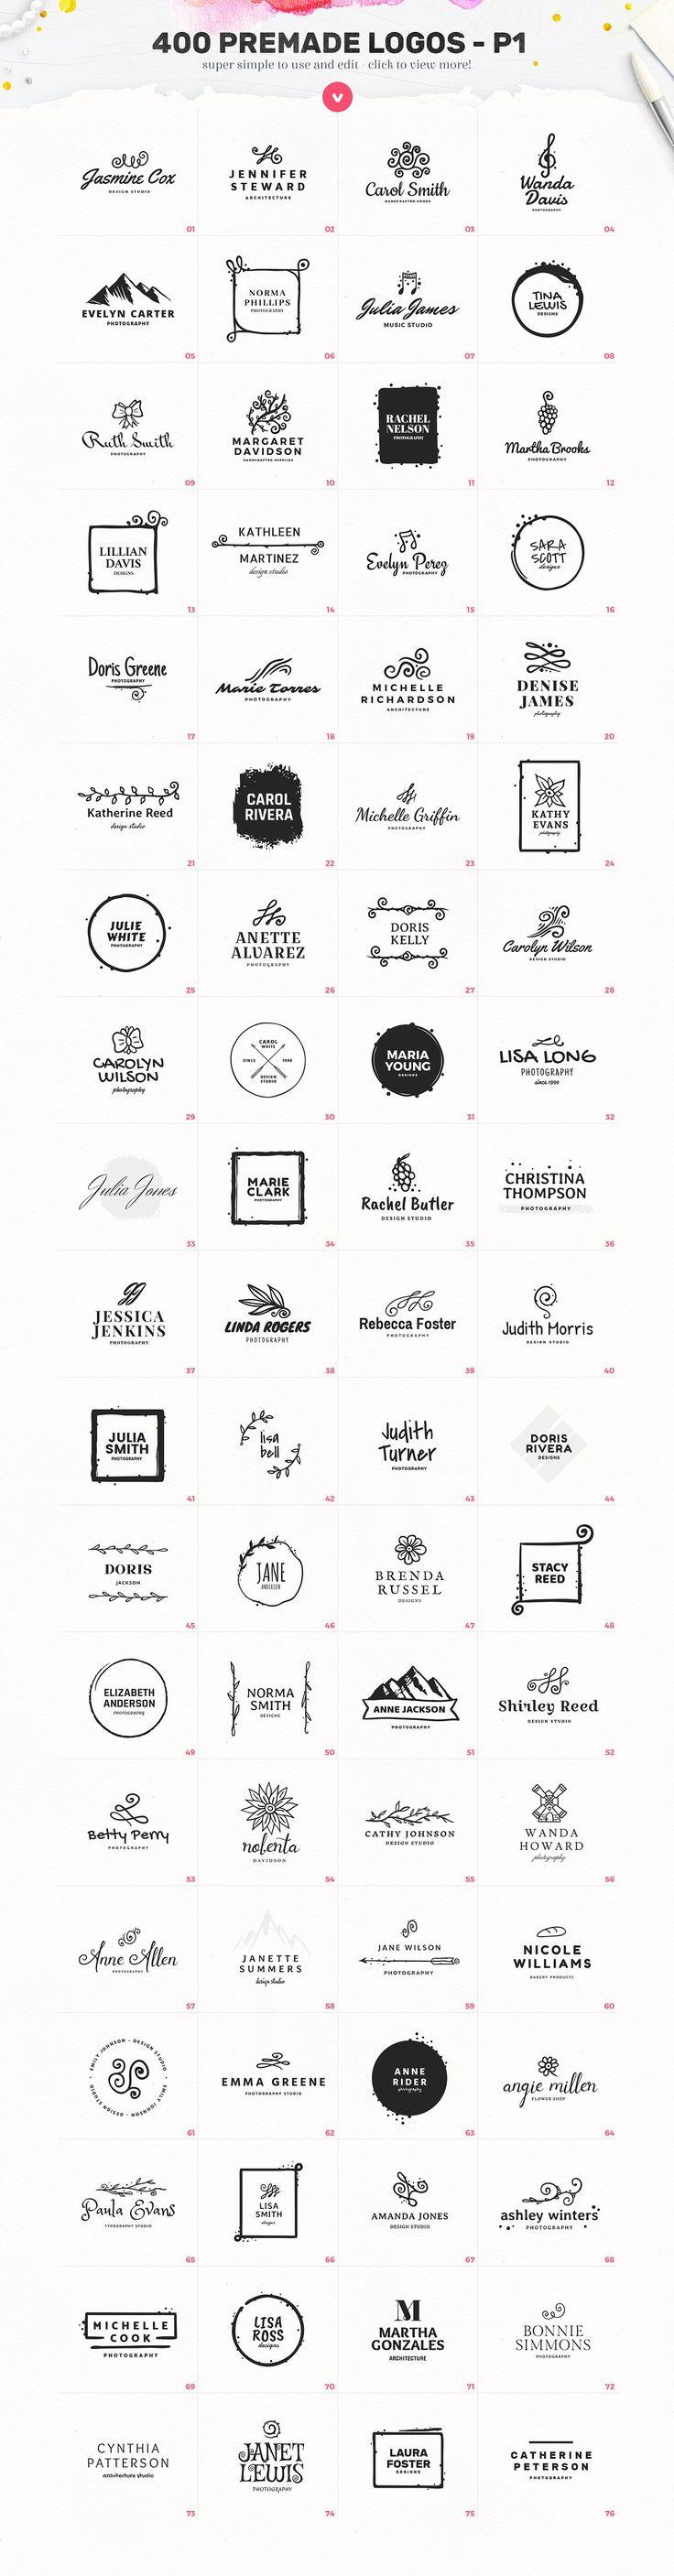 79 best logo design images on pinterest graph design graphics and